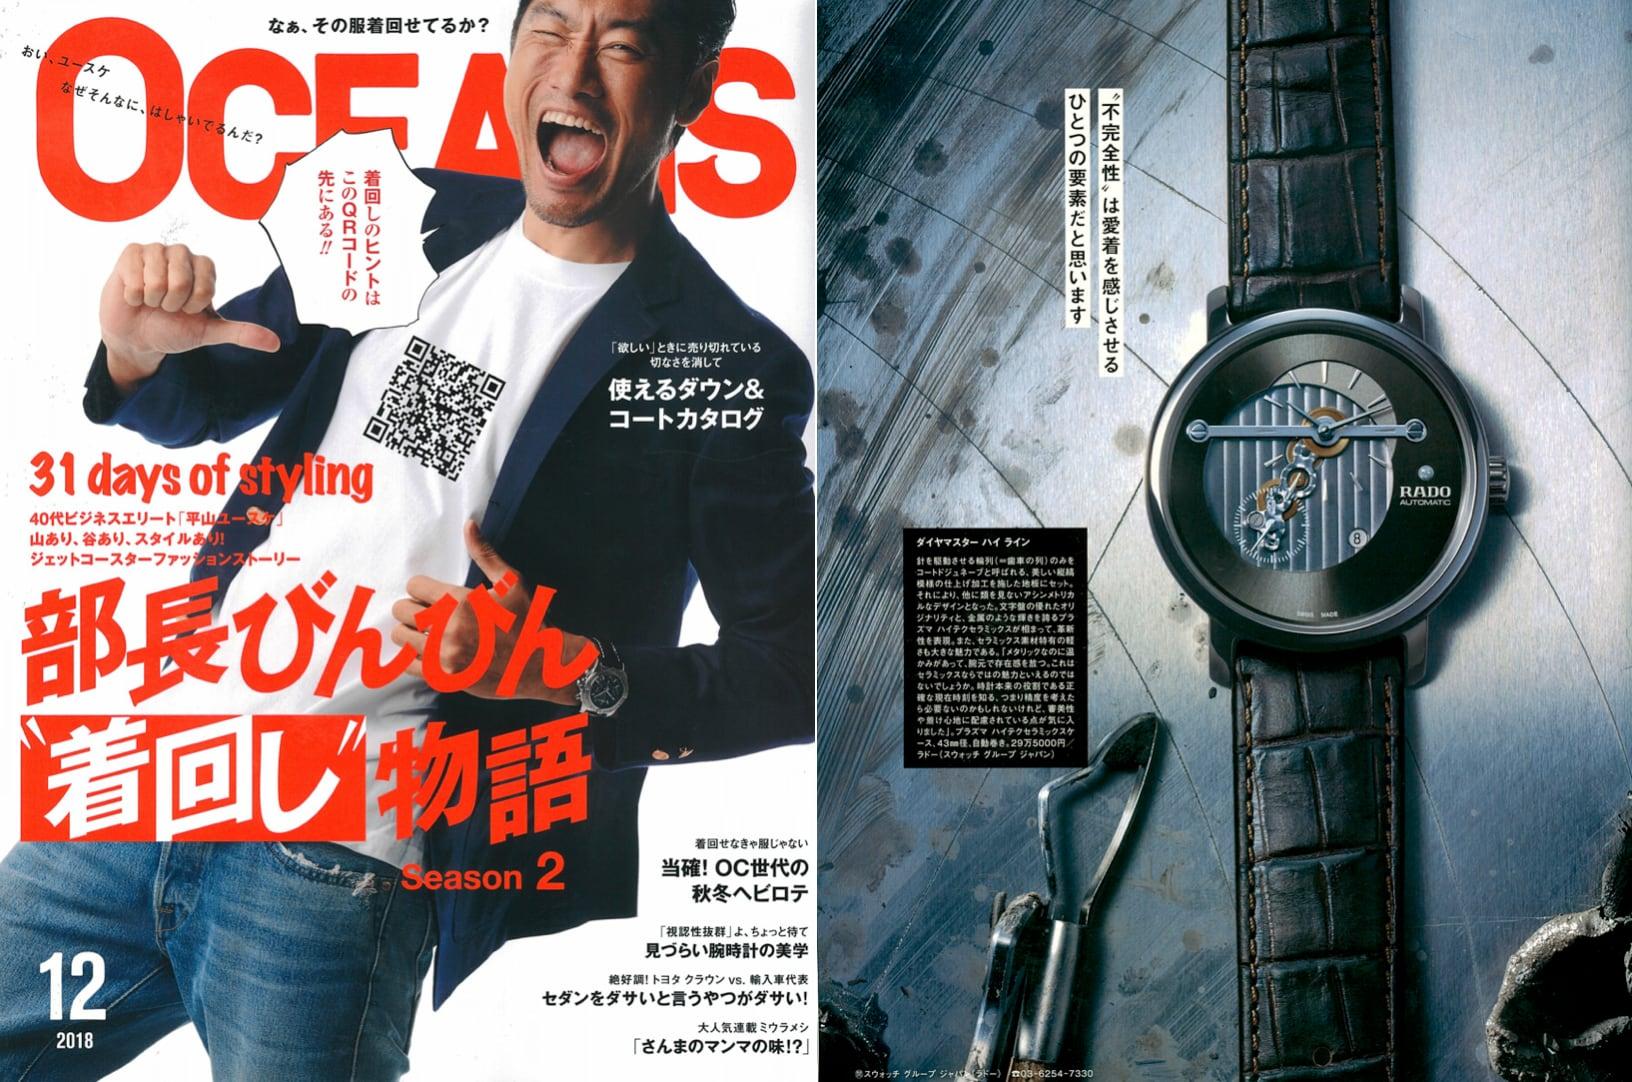 【RADO ラドー】DiaMaster Automatic Highline ダイヤマスター ハイライン(ブラウン)/国内正規品 腕時計